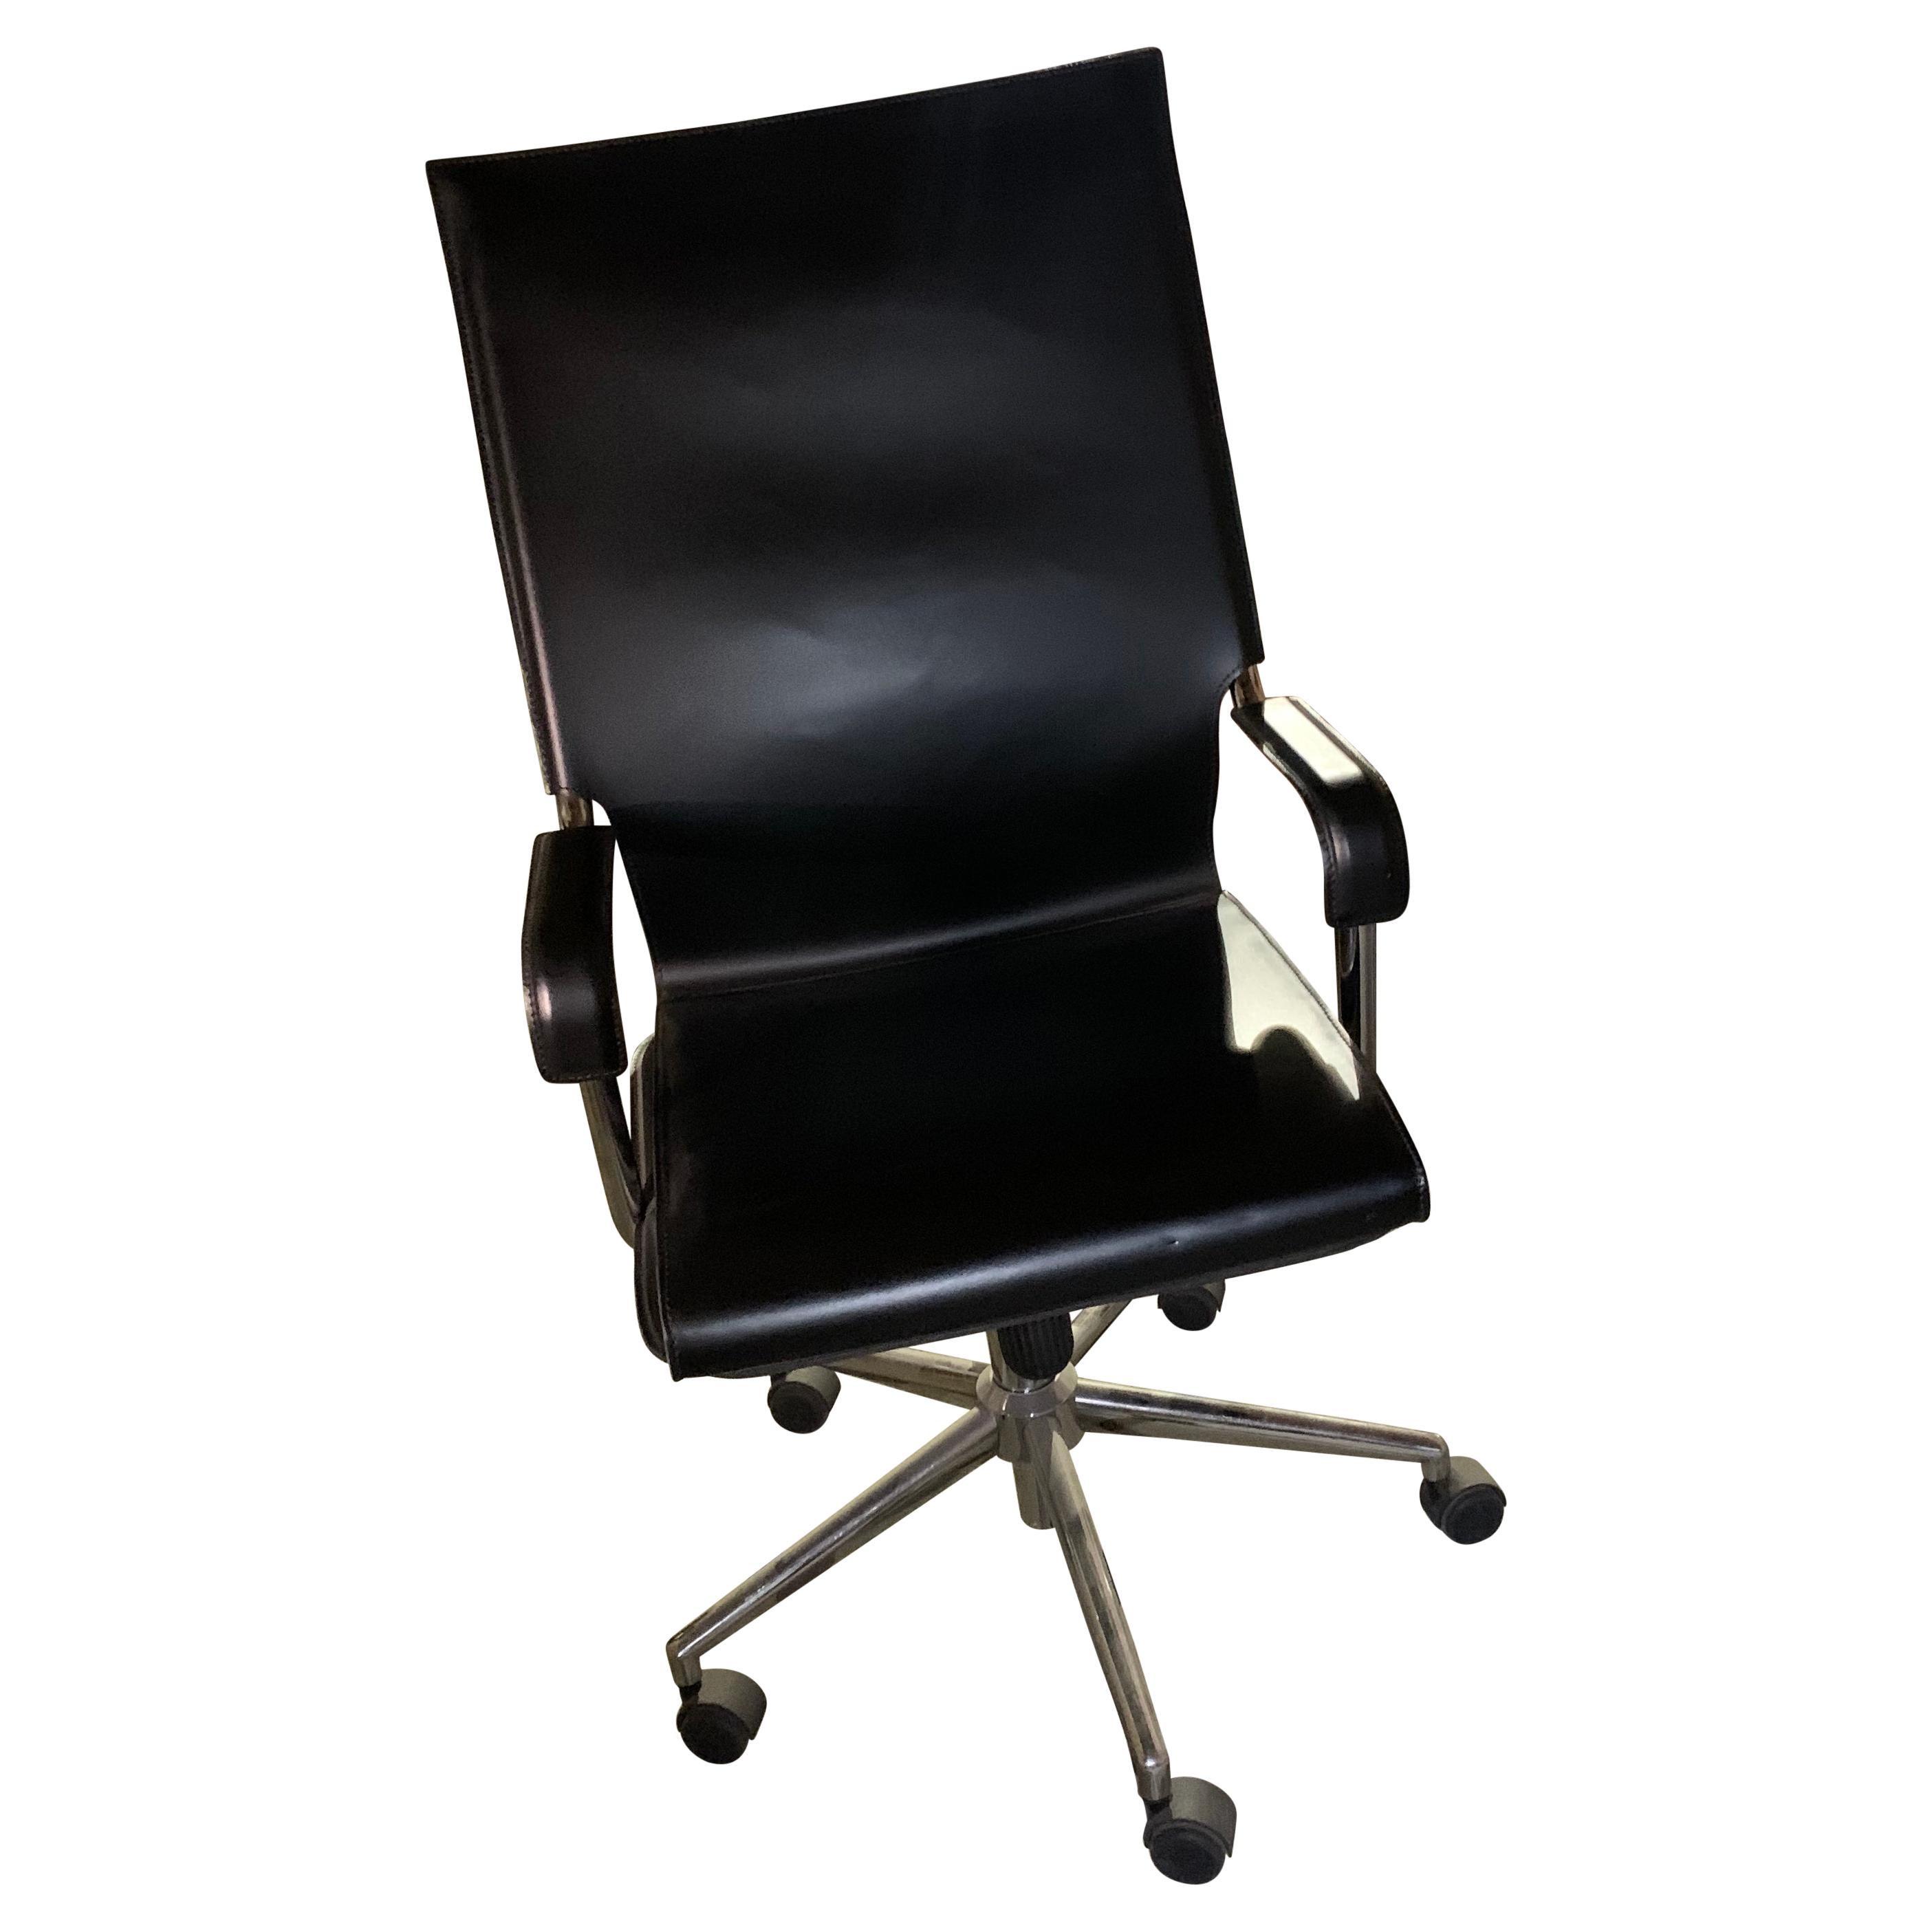 Marcatre Highback Archizoom Black Leather Desk Chair